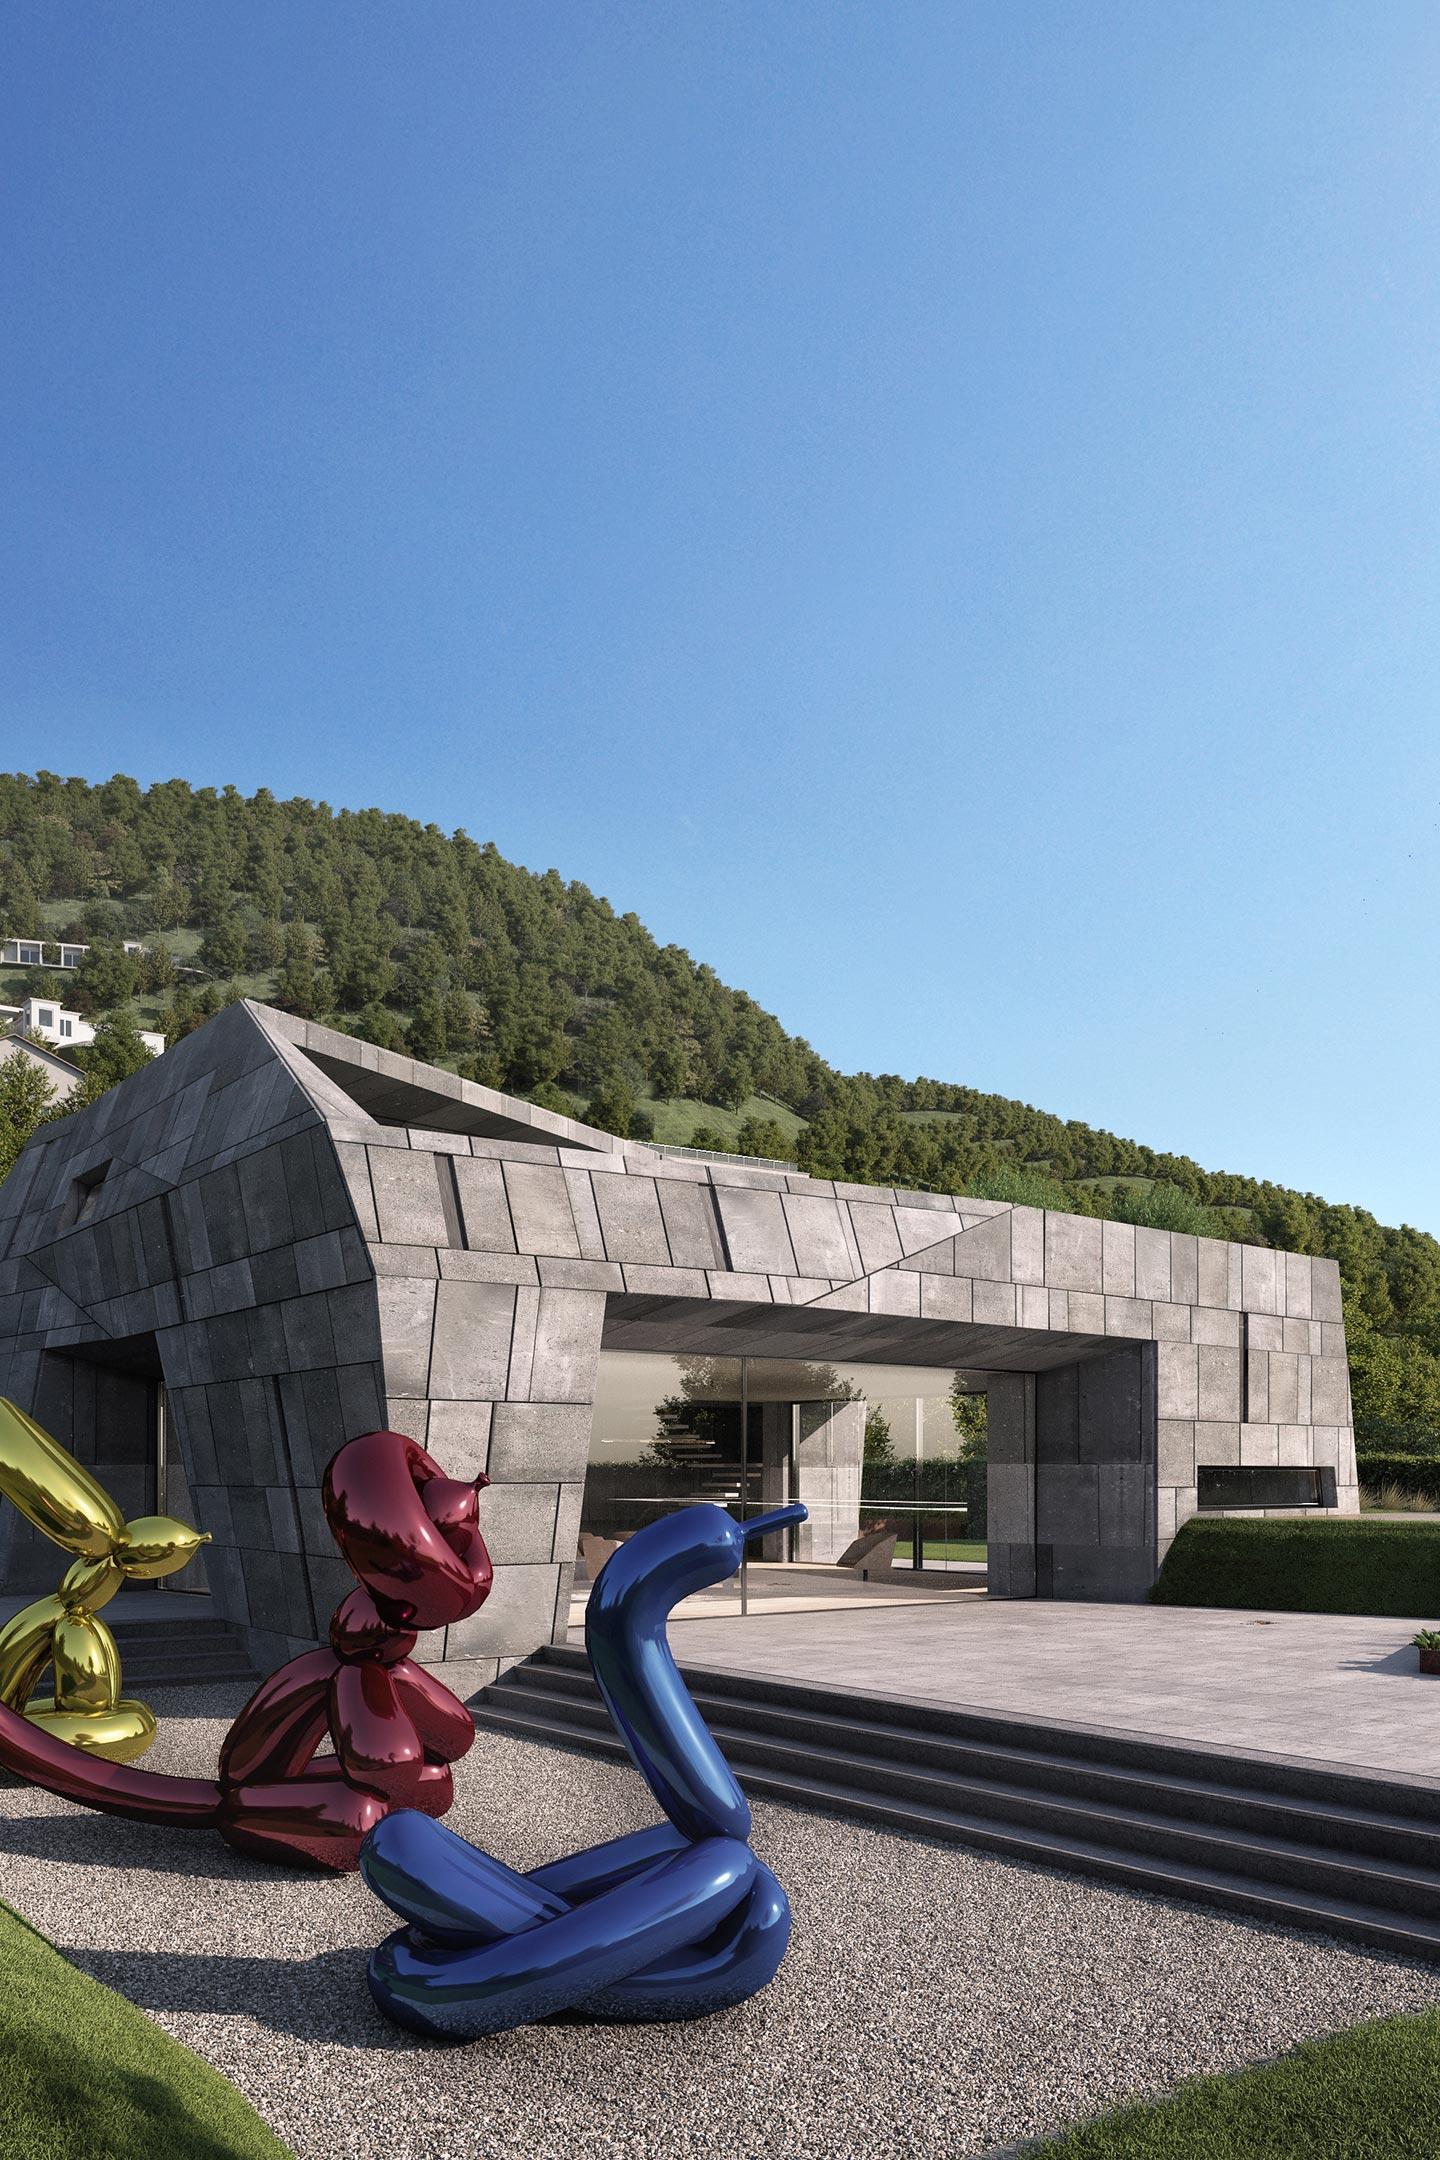 Wunschhaus_SMC_Fabio_Giacobello_web_3zu2_Statuen